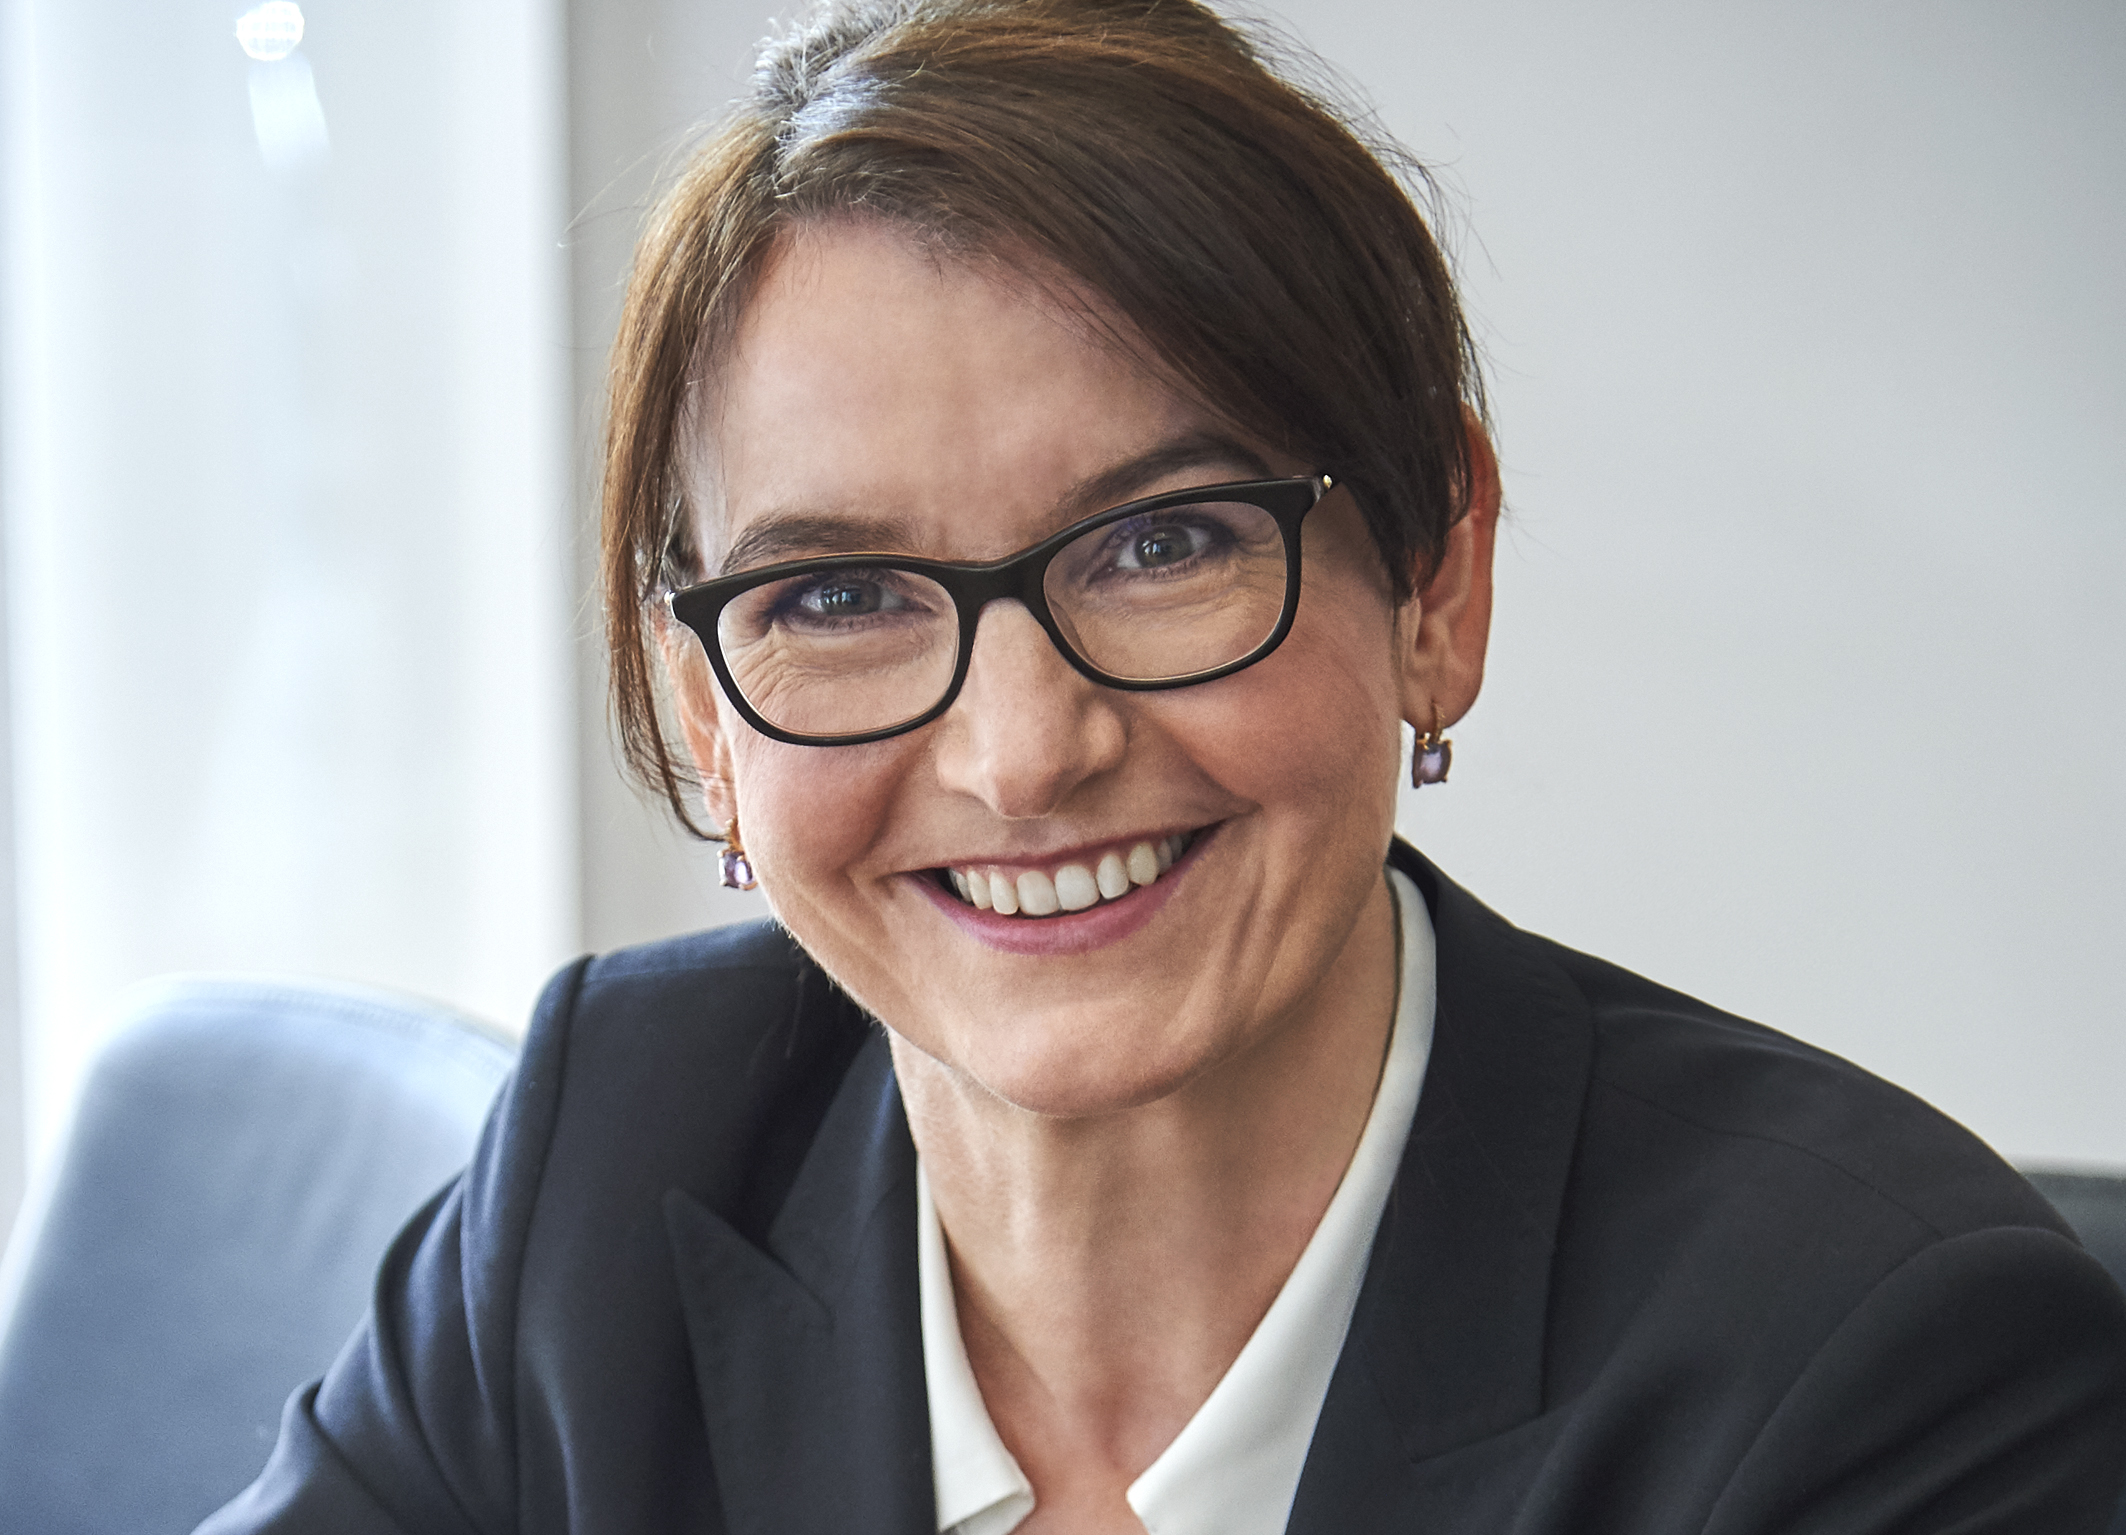 Iris Schörberl